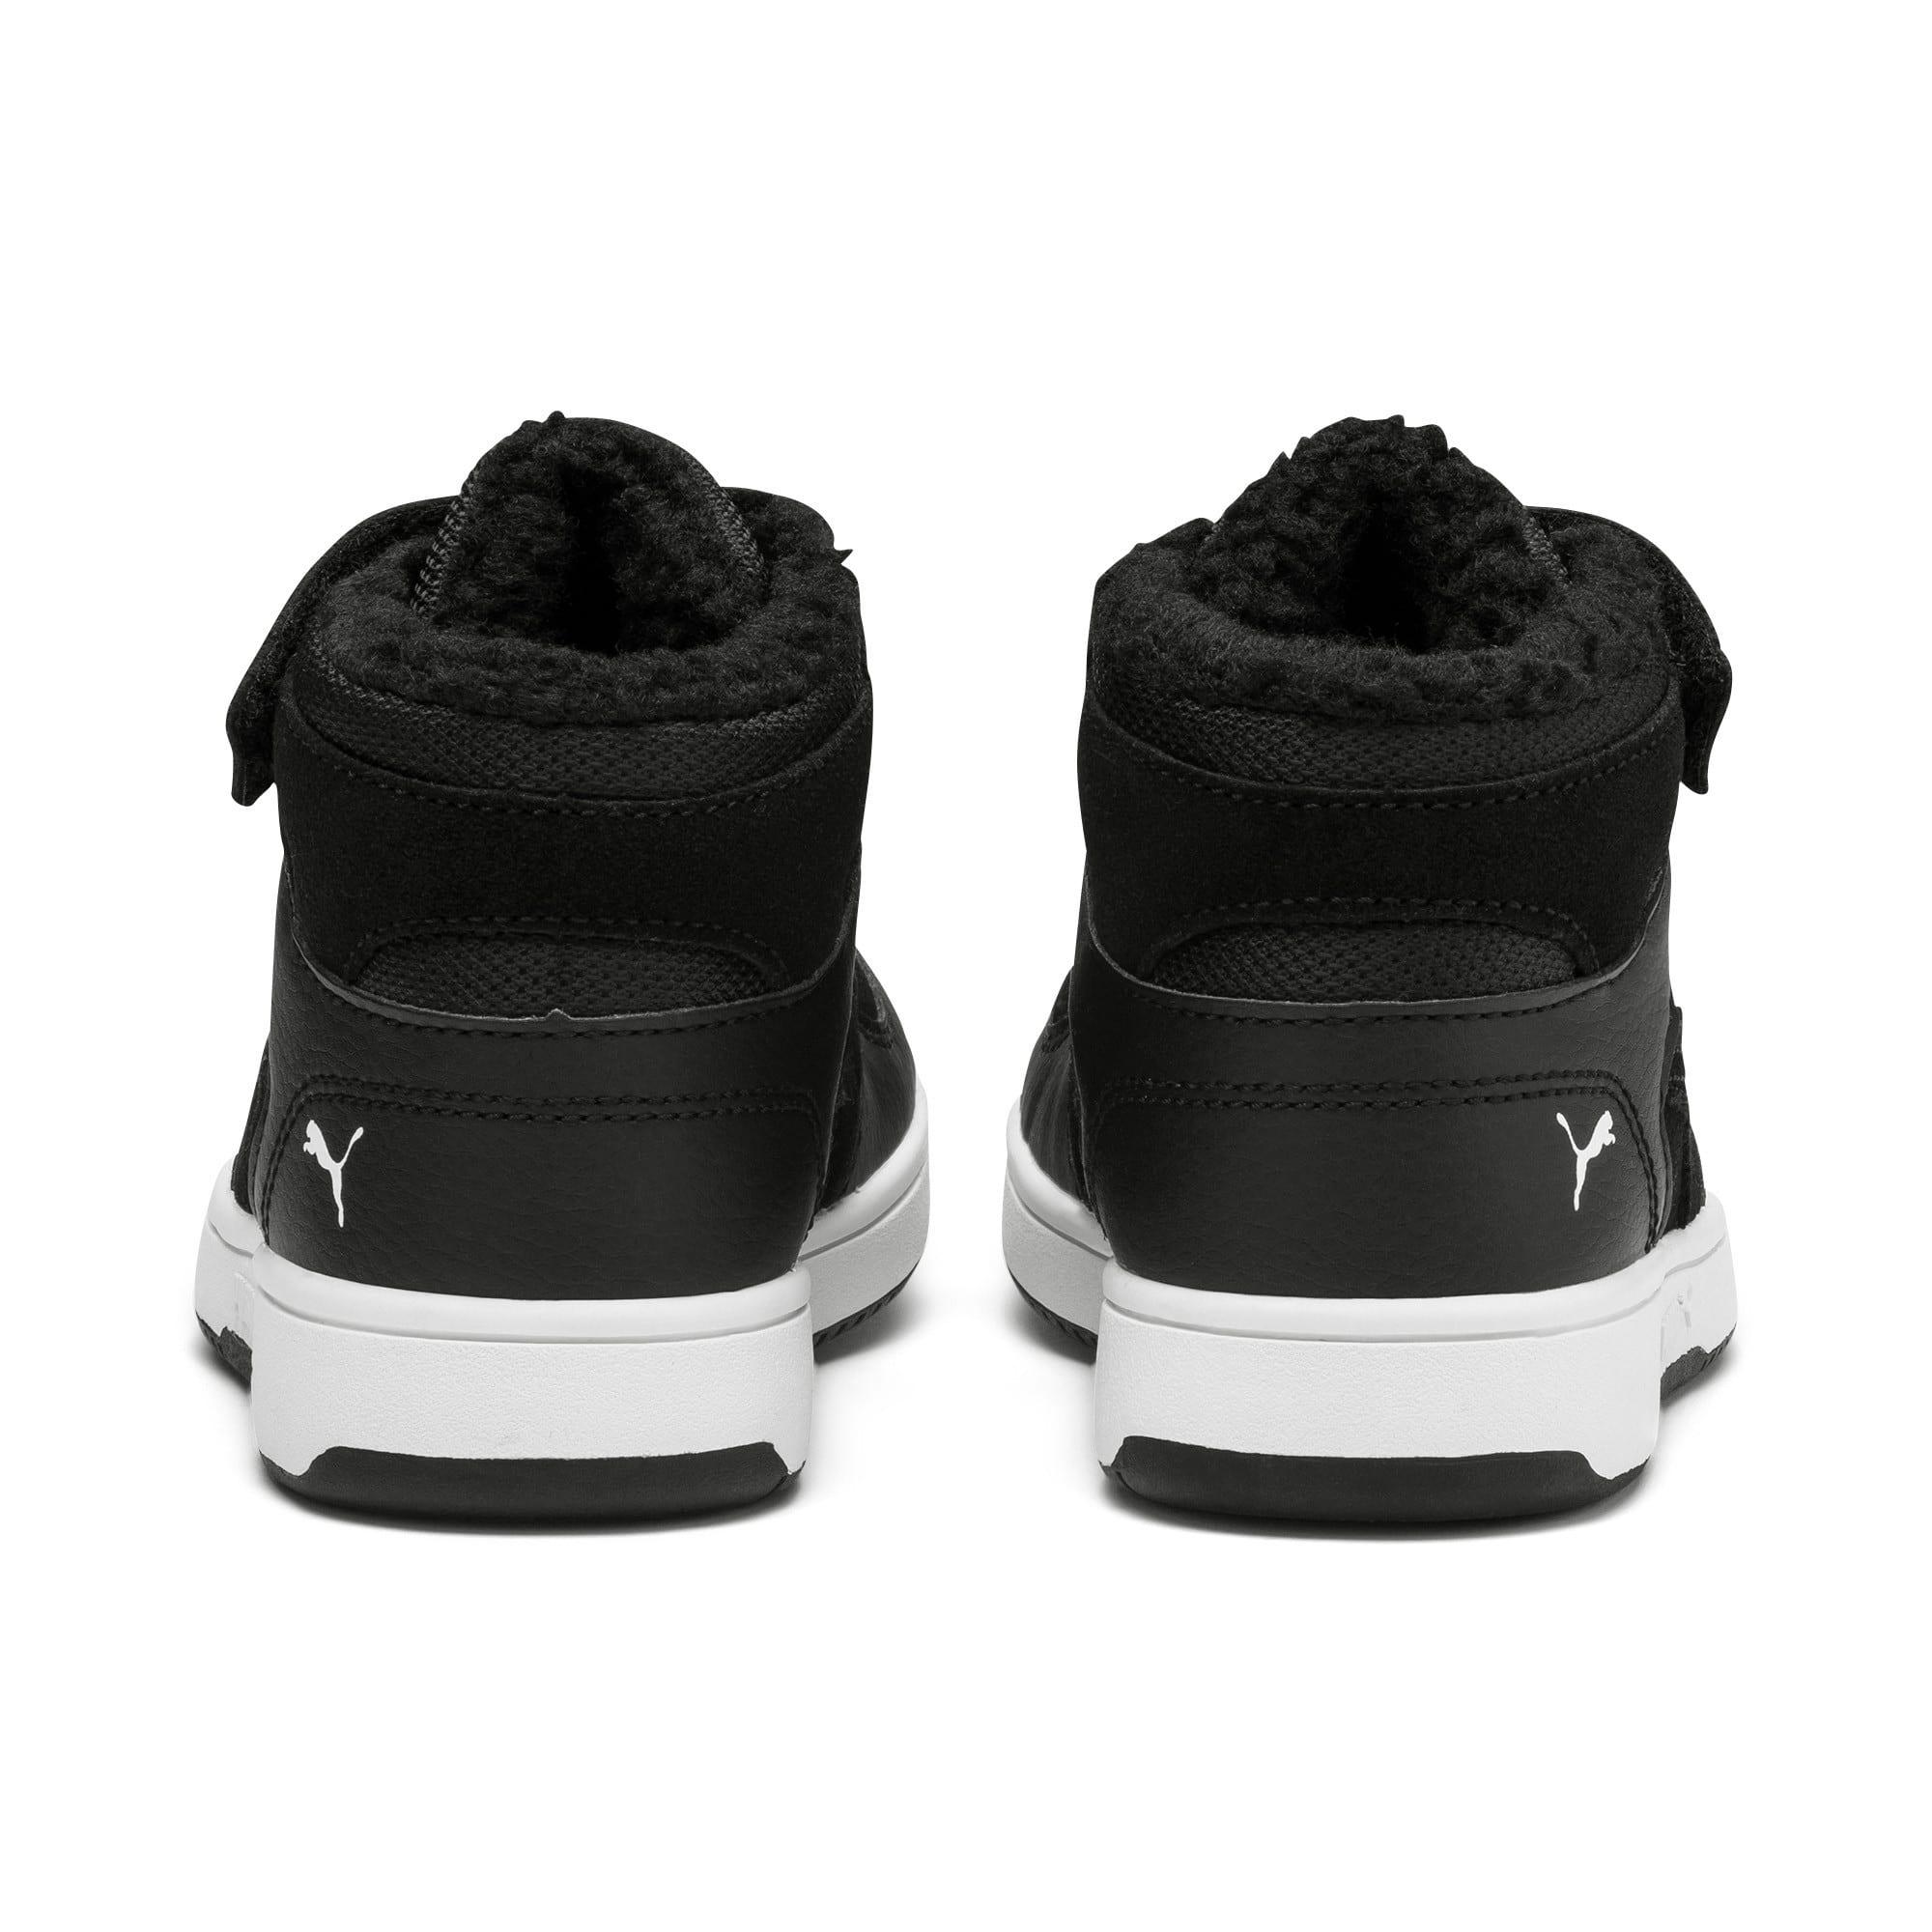 Thumbnail 3 of Rebound Lay-Up Fur V Kids Sneaker, Puma Black-Puma White, medium